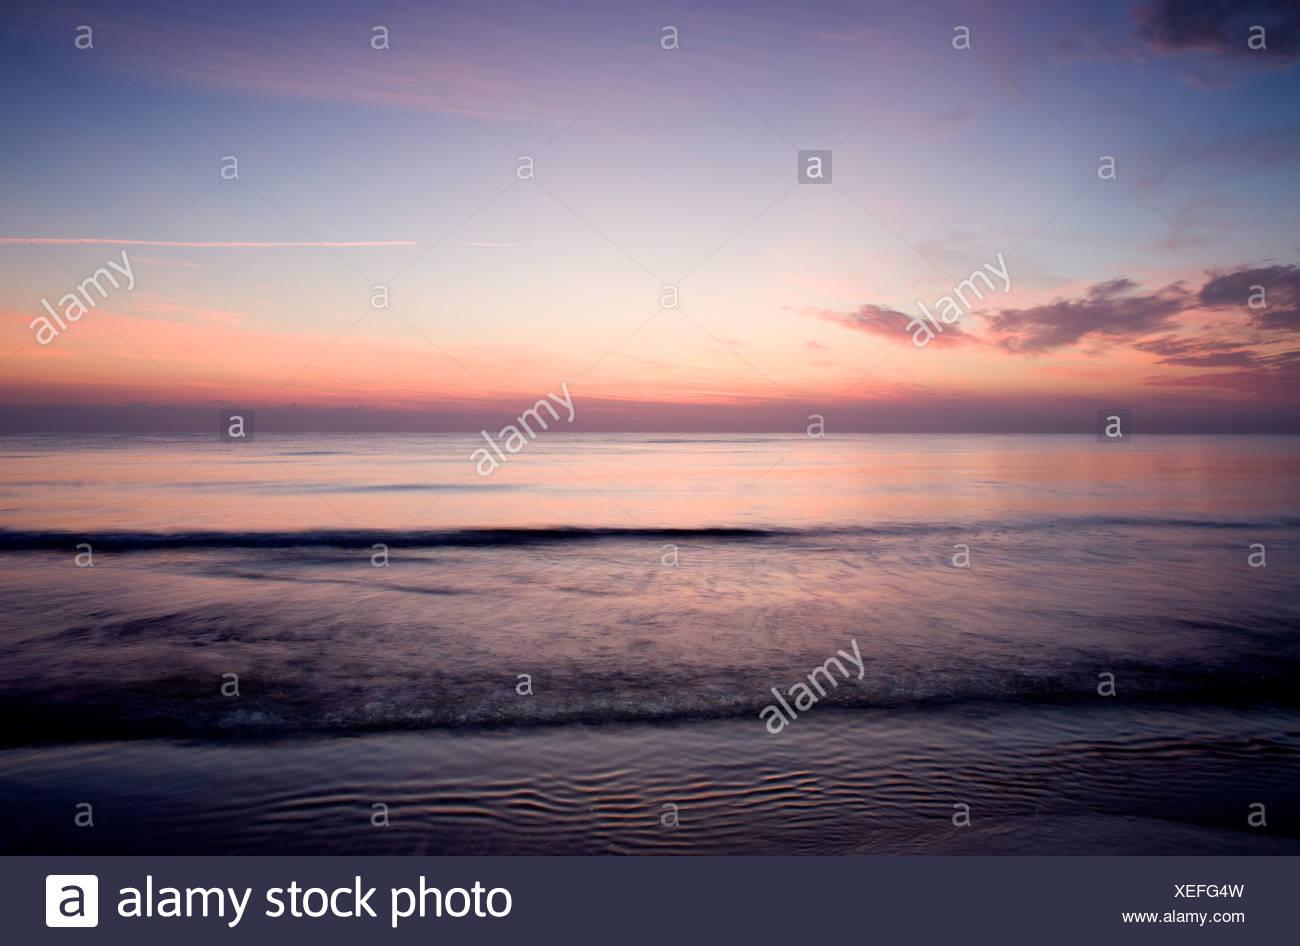 Seascape at sunset - Stock Image